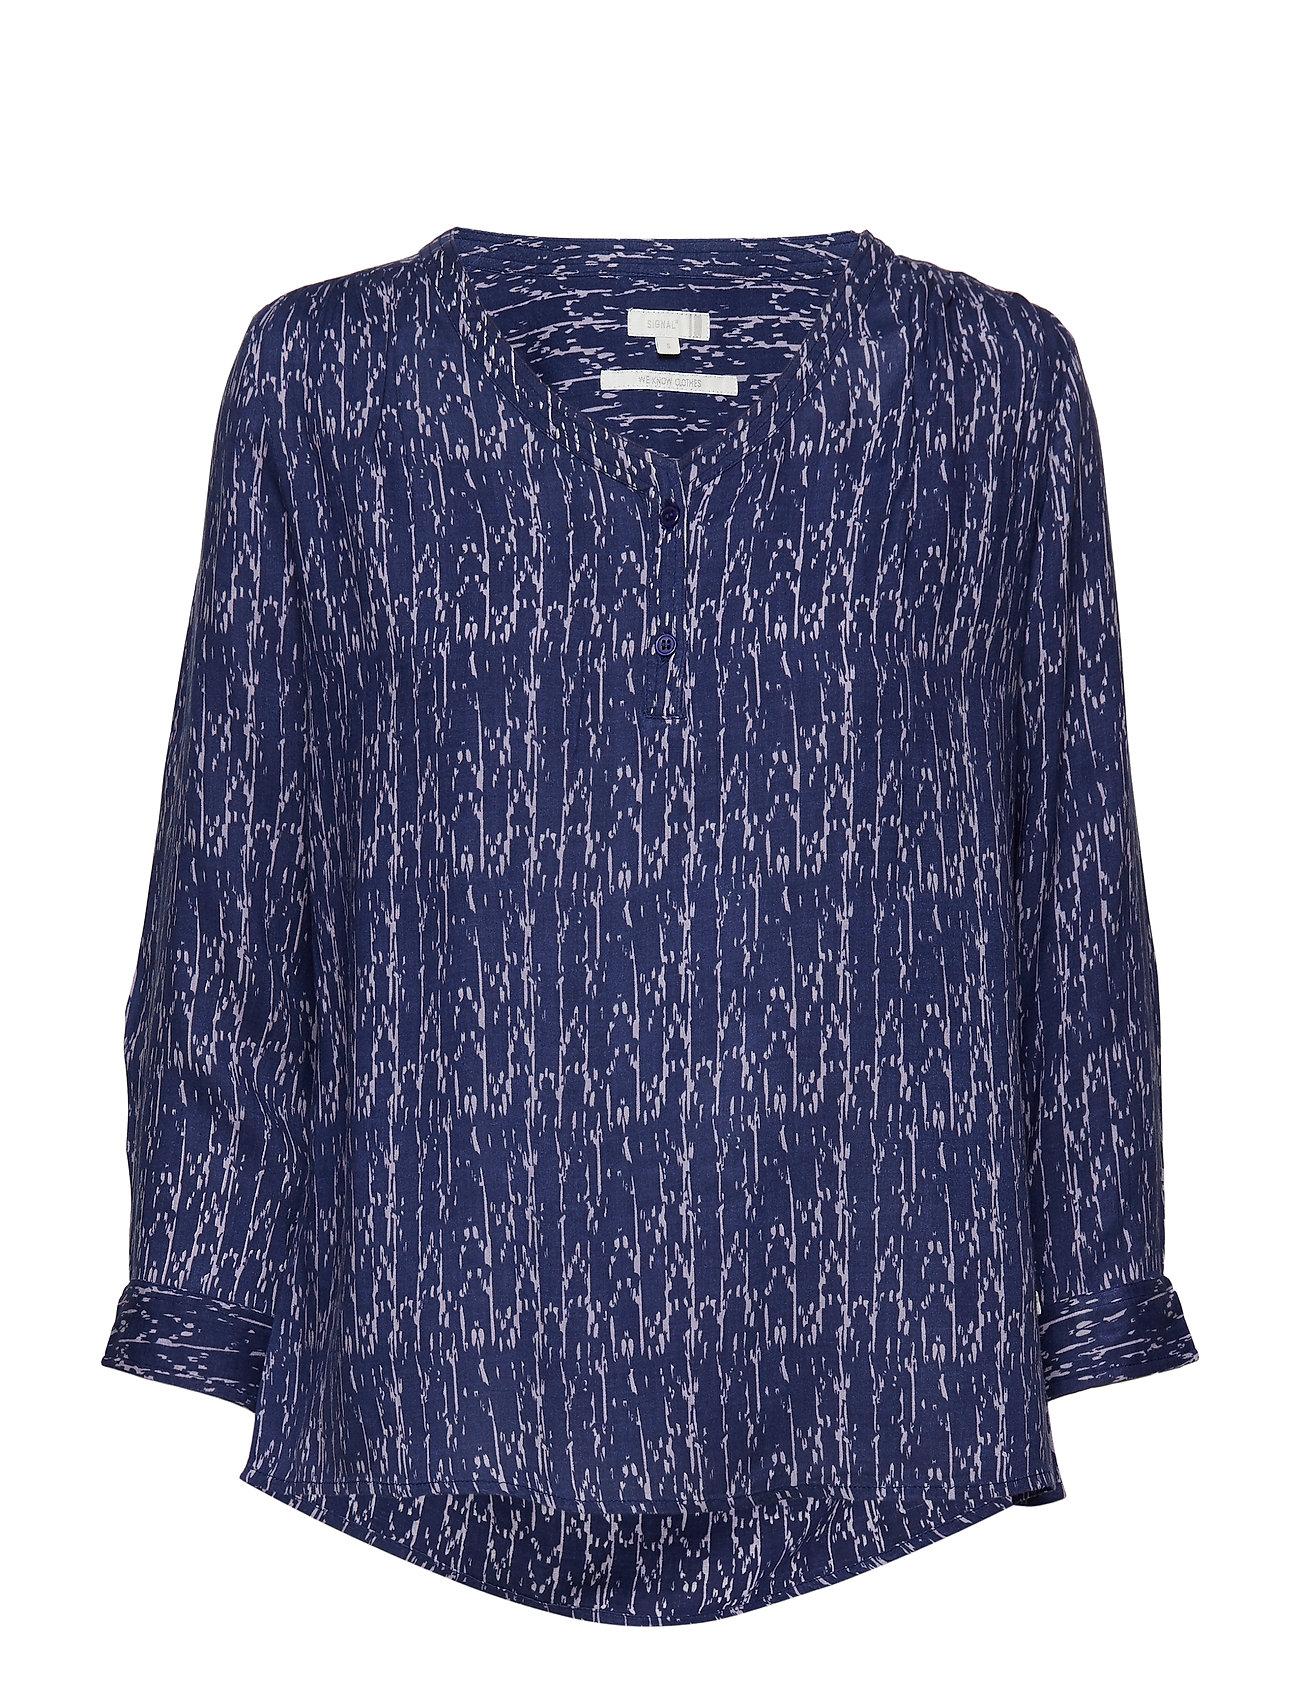 Signal Shirts - BLUE RIBBON